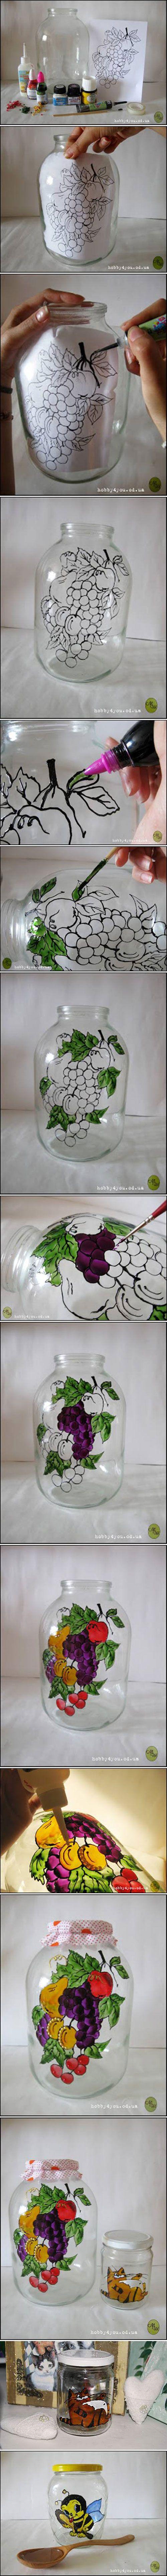 Handmade picturi pe sticla -Tutorial